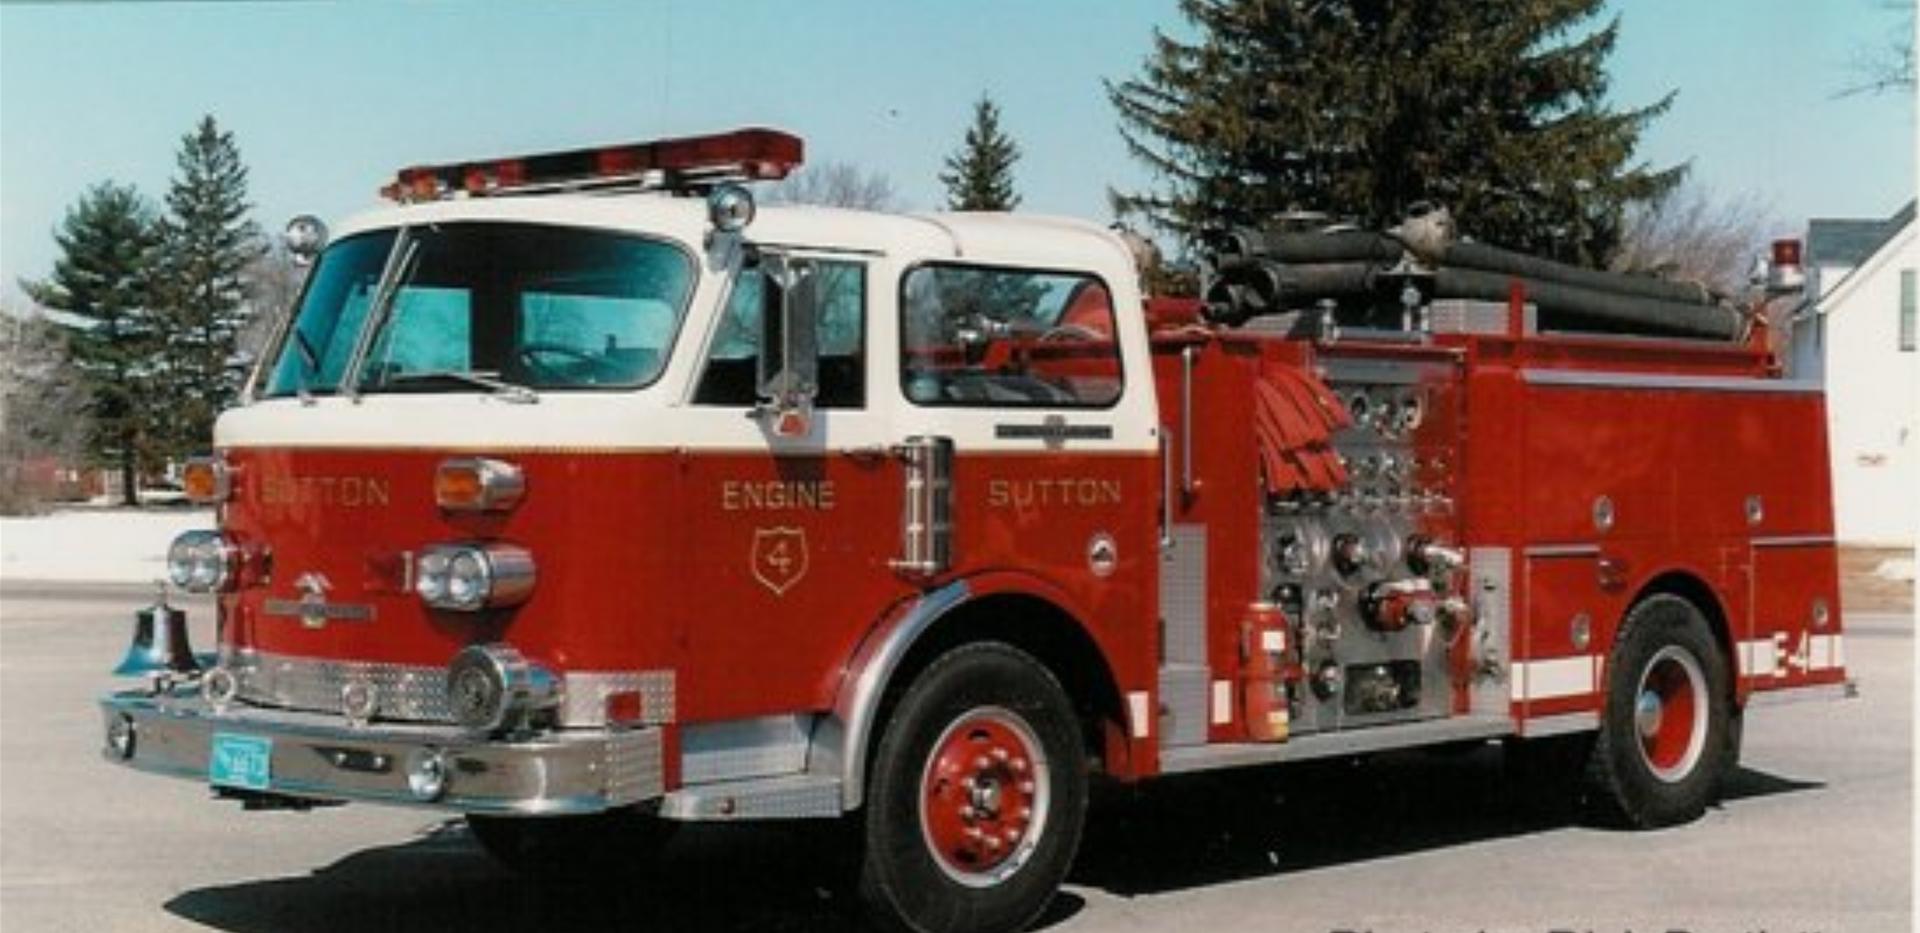 Sutton Engine 4.png